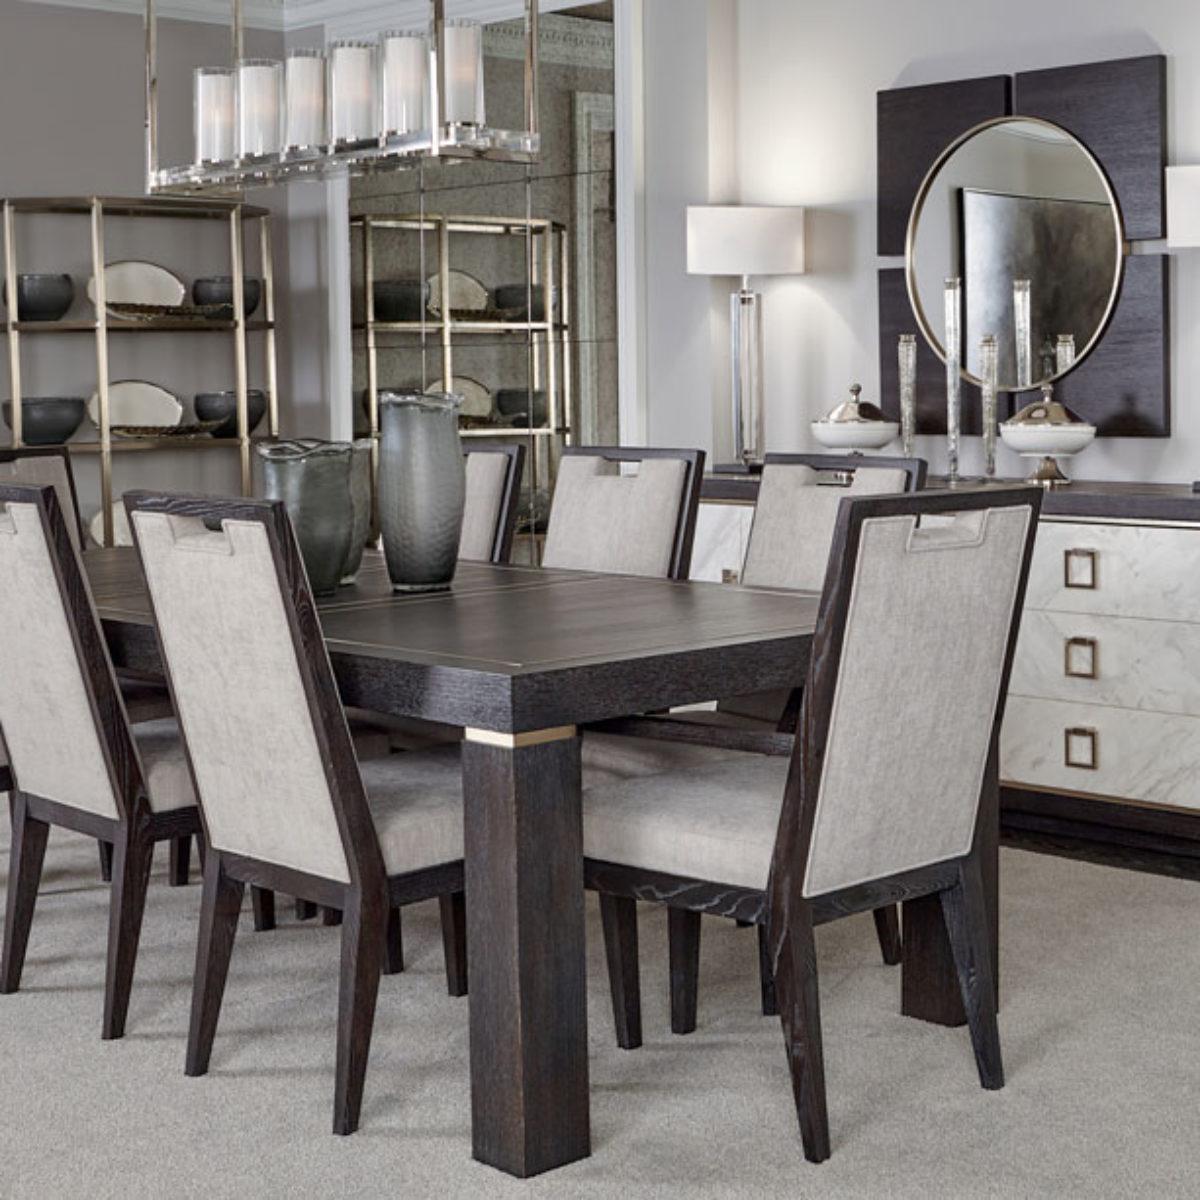 Table Bernhardt Project White Wood Floor